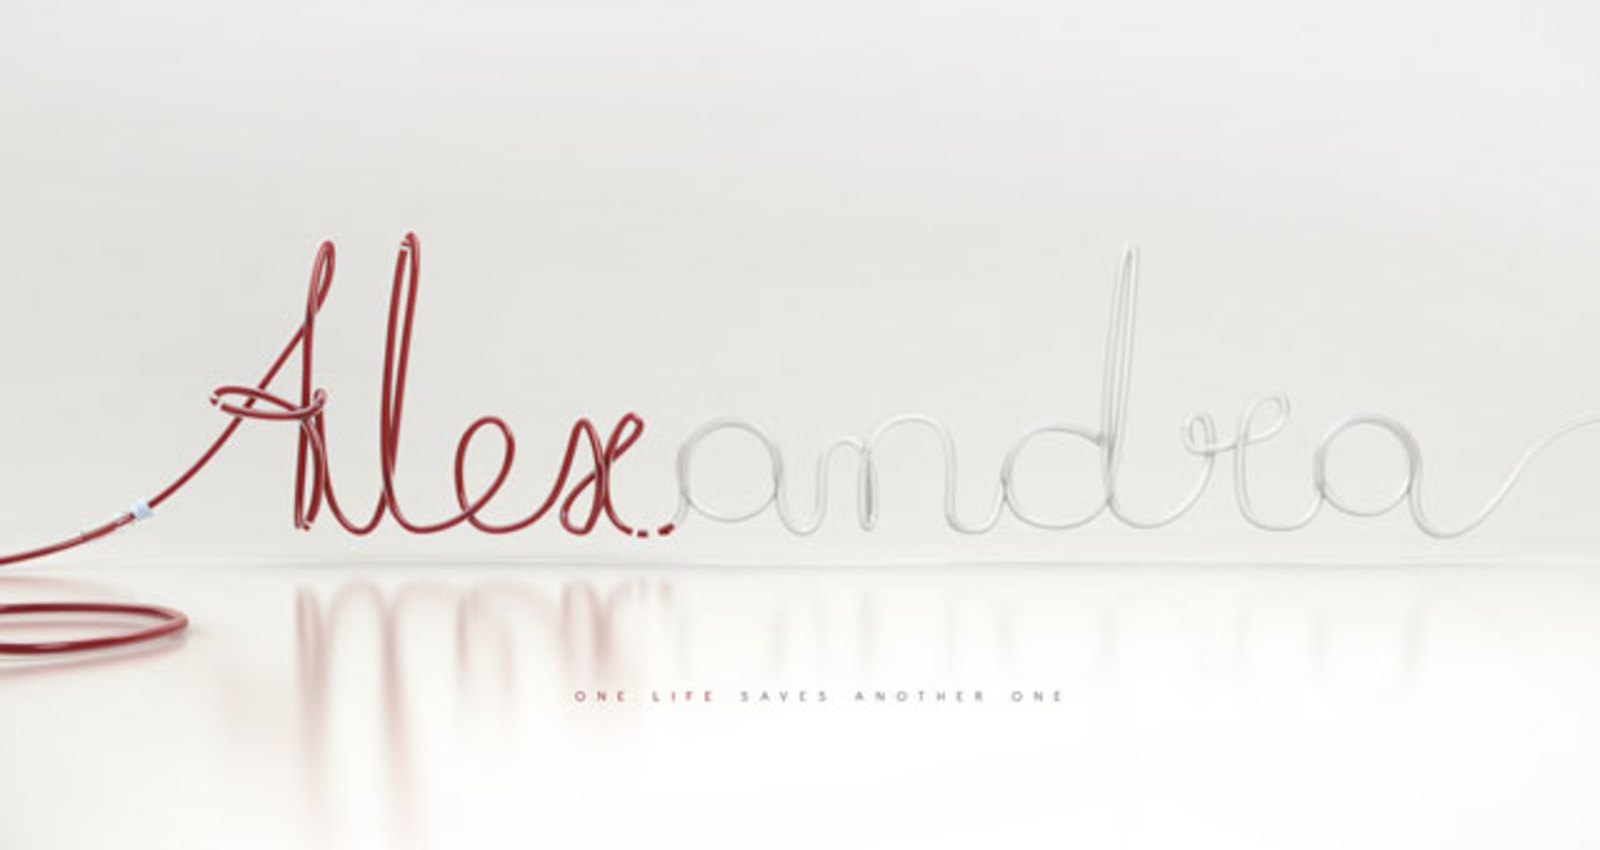 Alex-andra